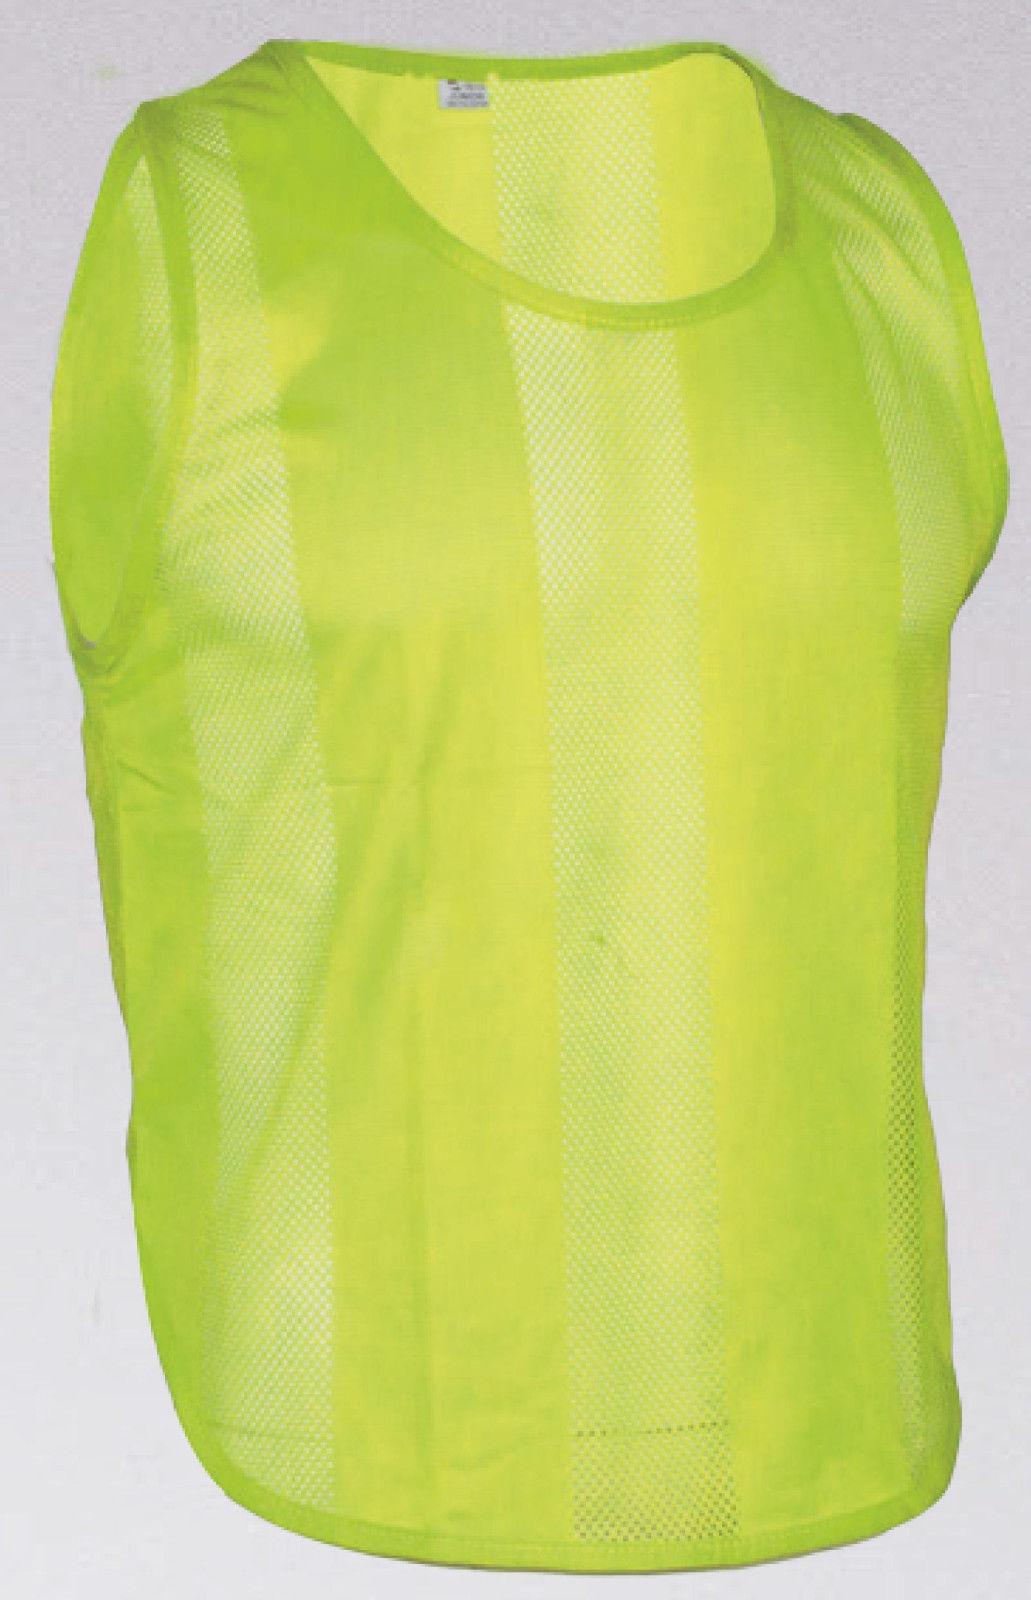 10x Markierungshemden / Trainingsleibchen - 7 Farben & 3 Größen lieferbar*NEU*